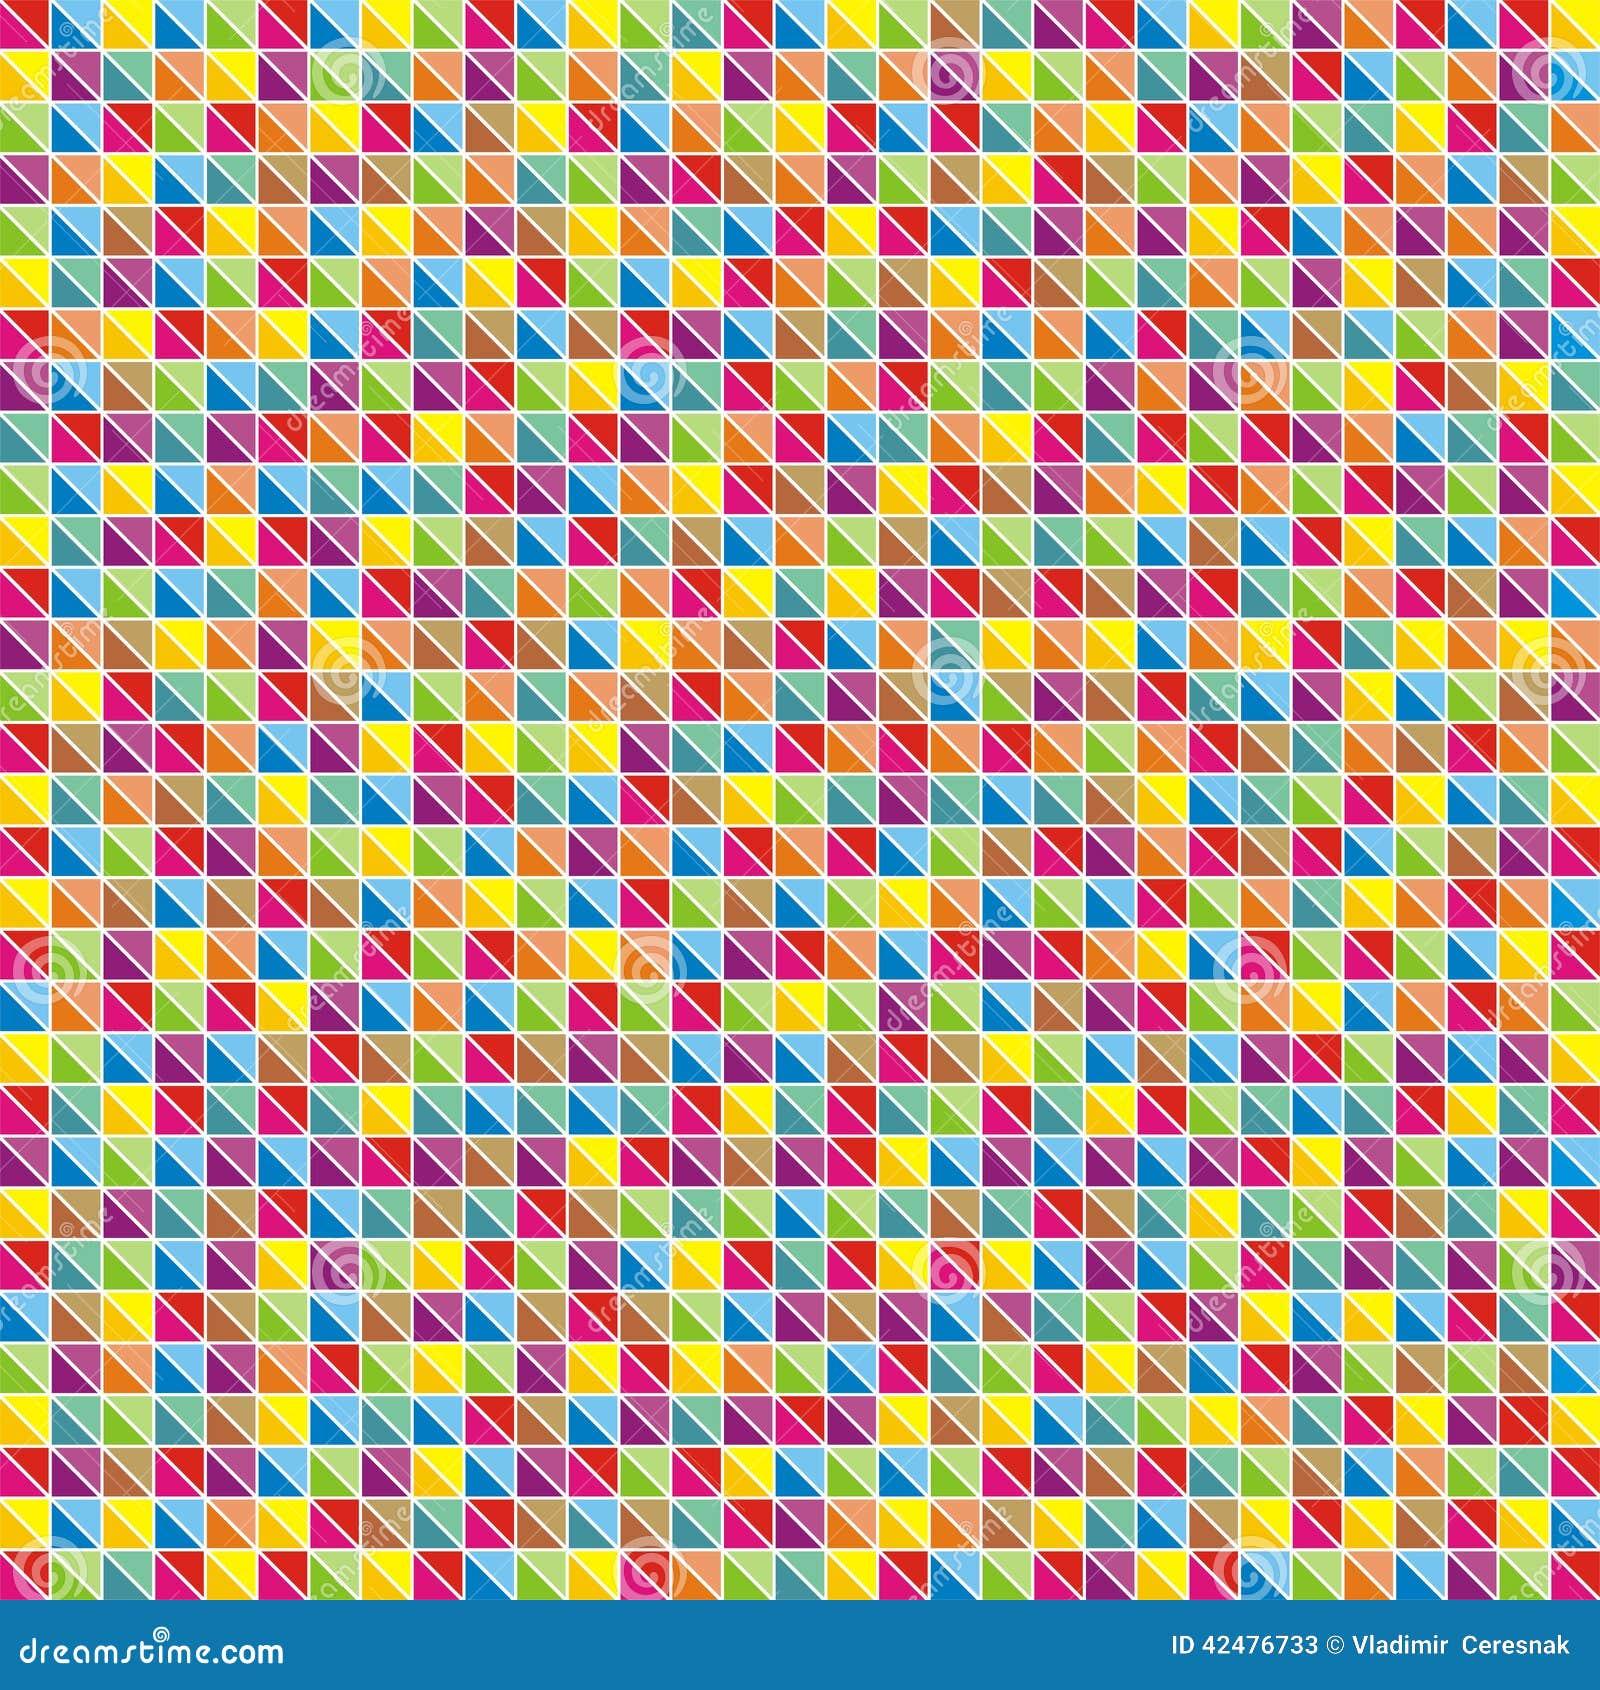 Mosaique Multicolore Des Triangles Illustration De Vecteur Illustration Du Multicolore Triangles 42476733